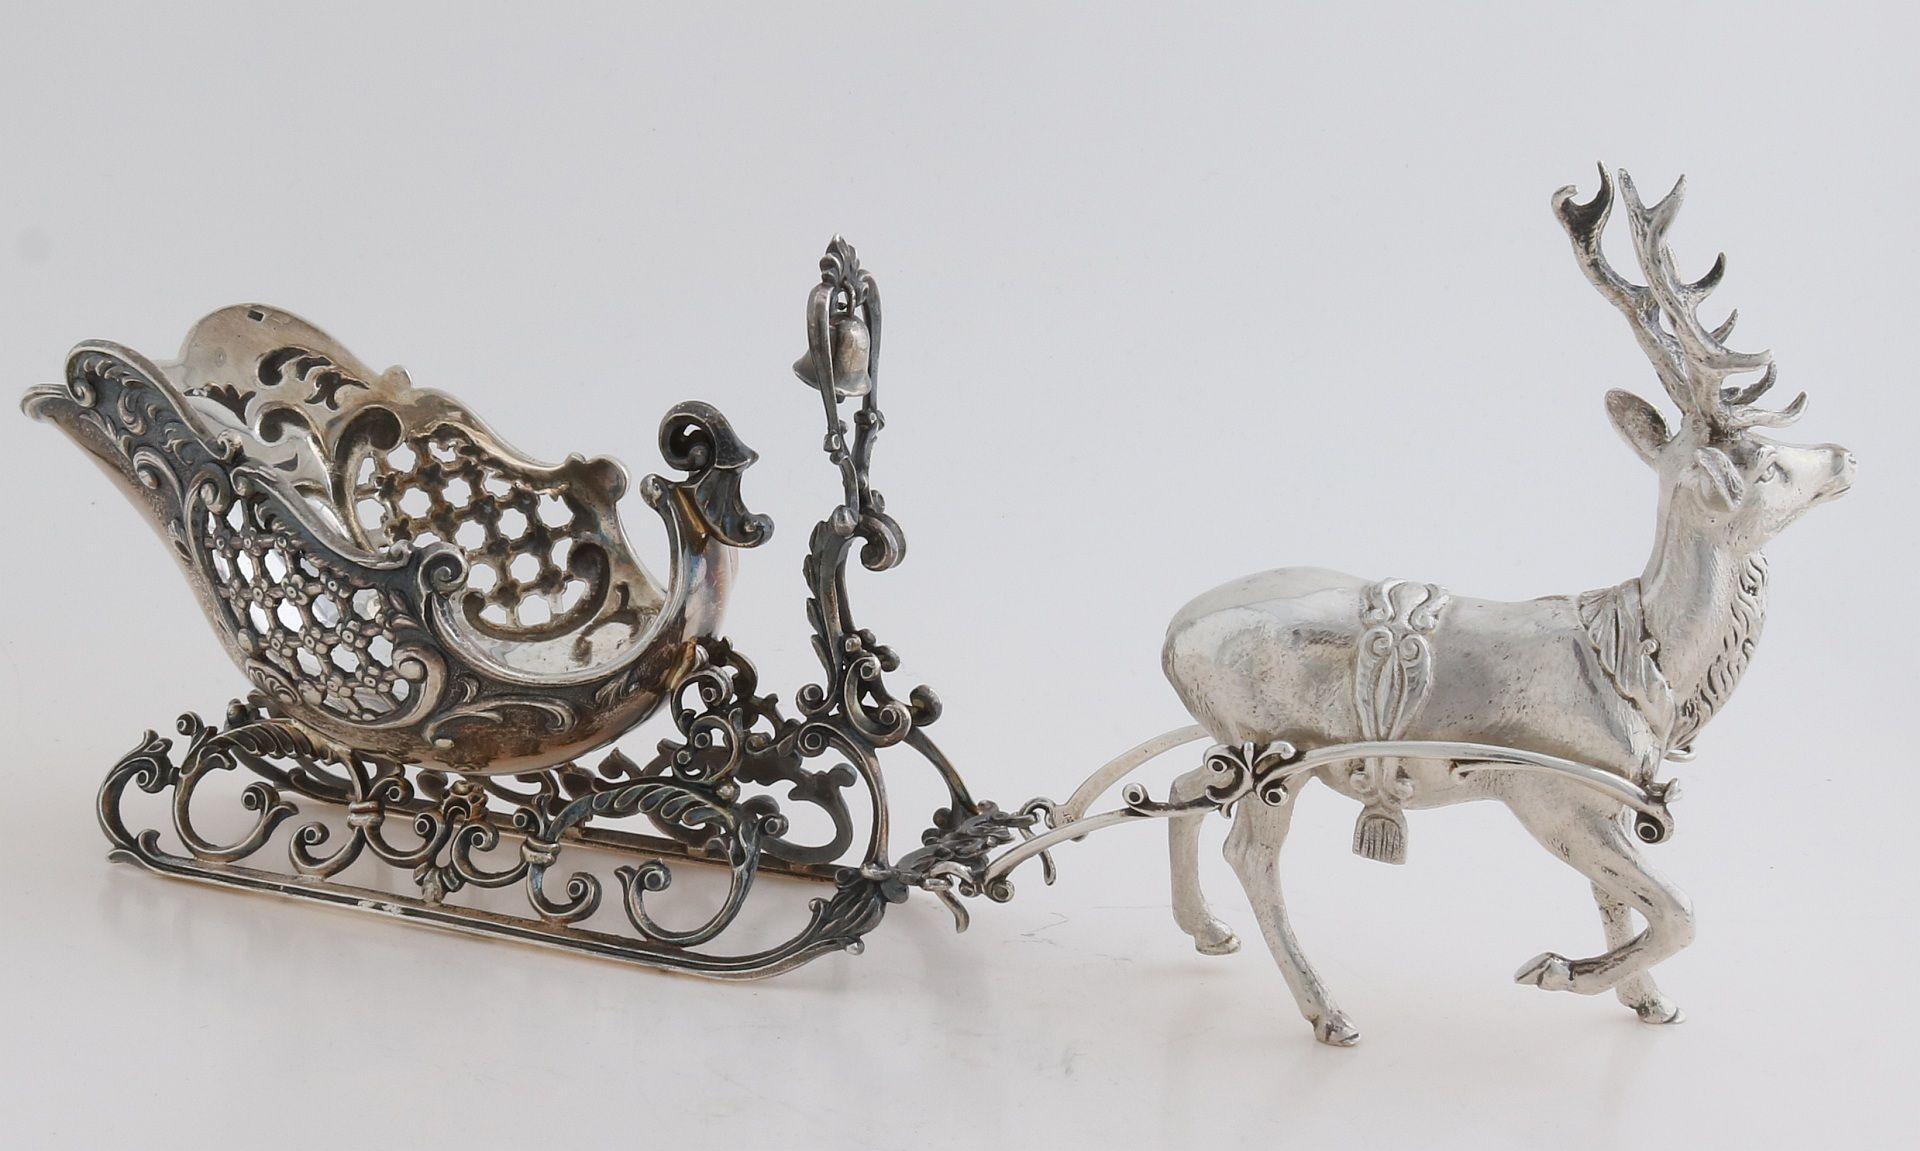 Silver sleigh